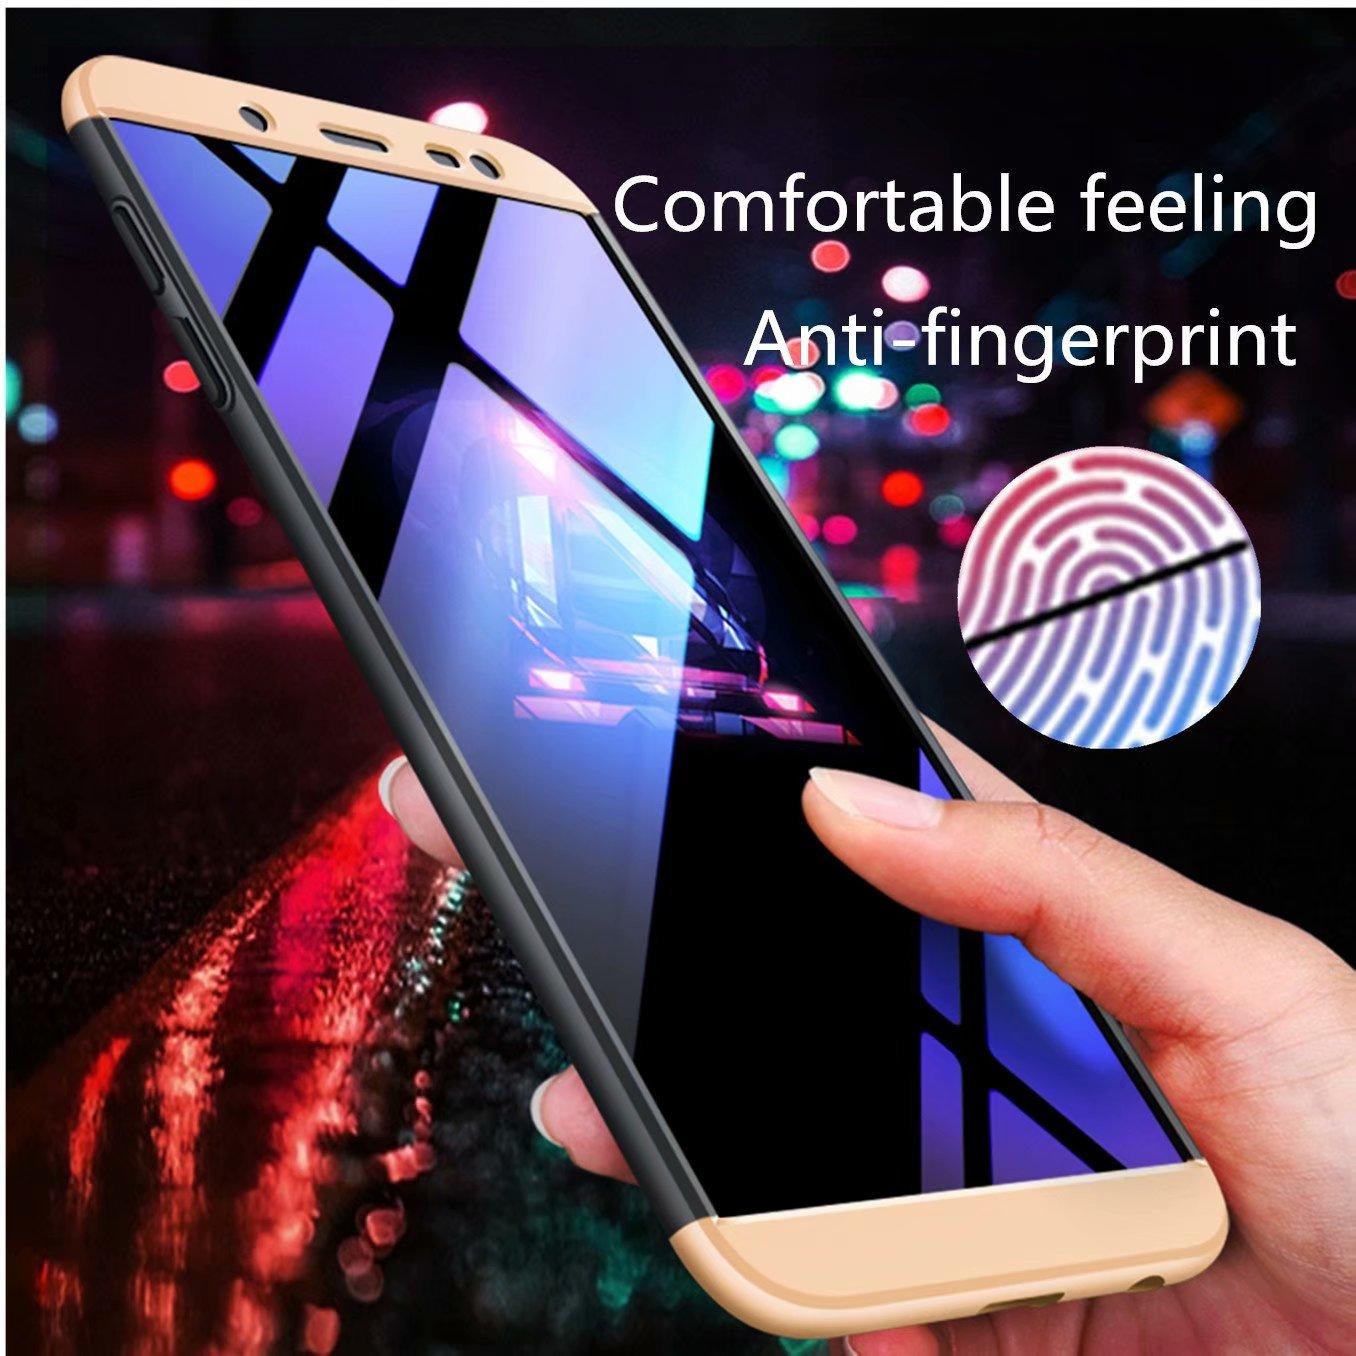 AILZH Compatibles para Funda Samsung Galaxy J6 Plus 2018 Carcasa+ Rojo Negro Cristal Templado 360 Grados Caja protecci/ón de c/áscara Dura Anti-Shock Caso Mate Bumper Antichoque Case Cover